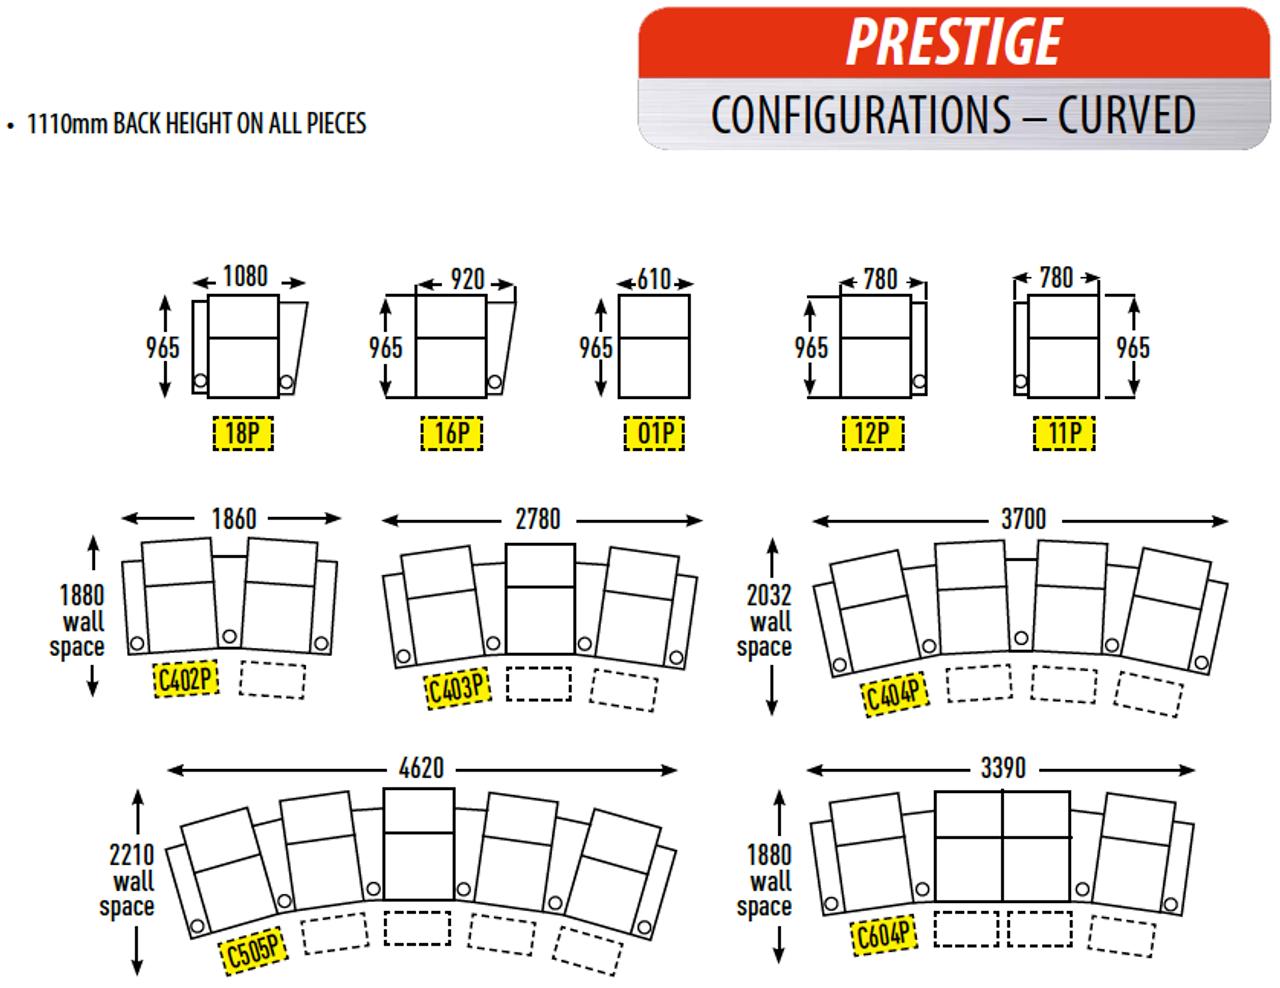 RowOne Prestige Premium Cinema Seating